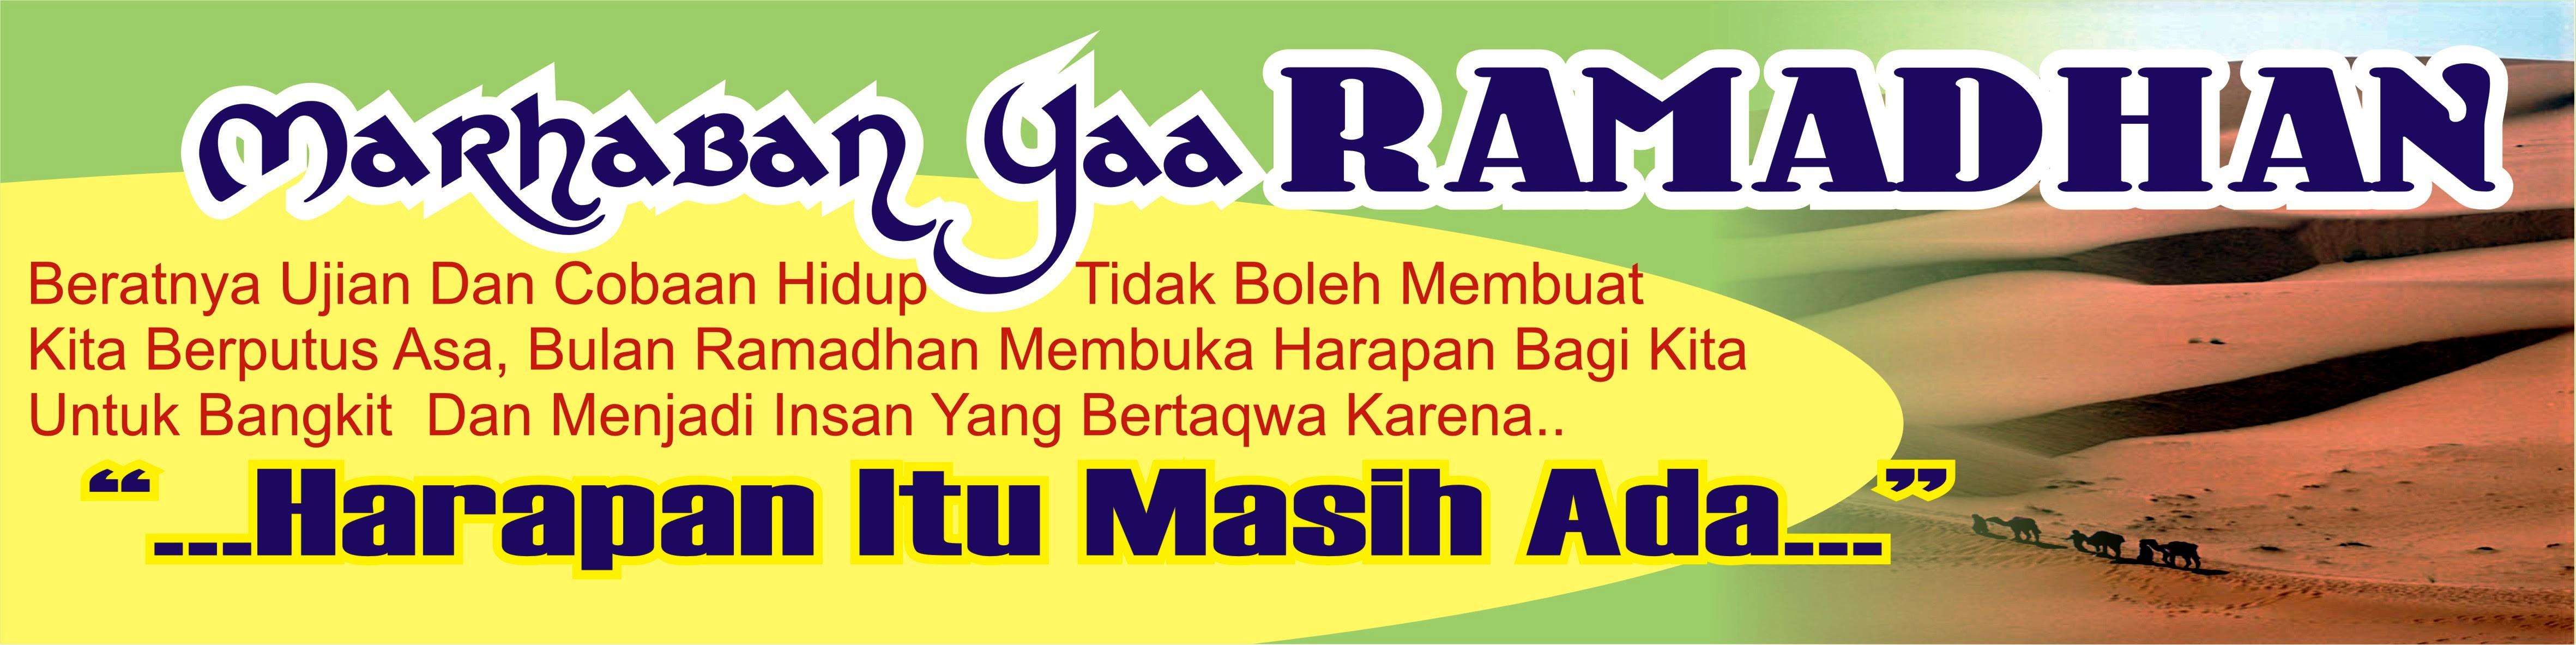 Contoh Banner Menyambut Ramadhan - Downlllll